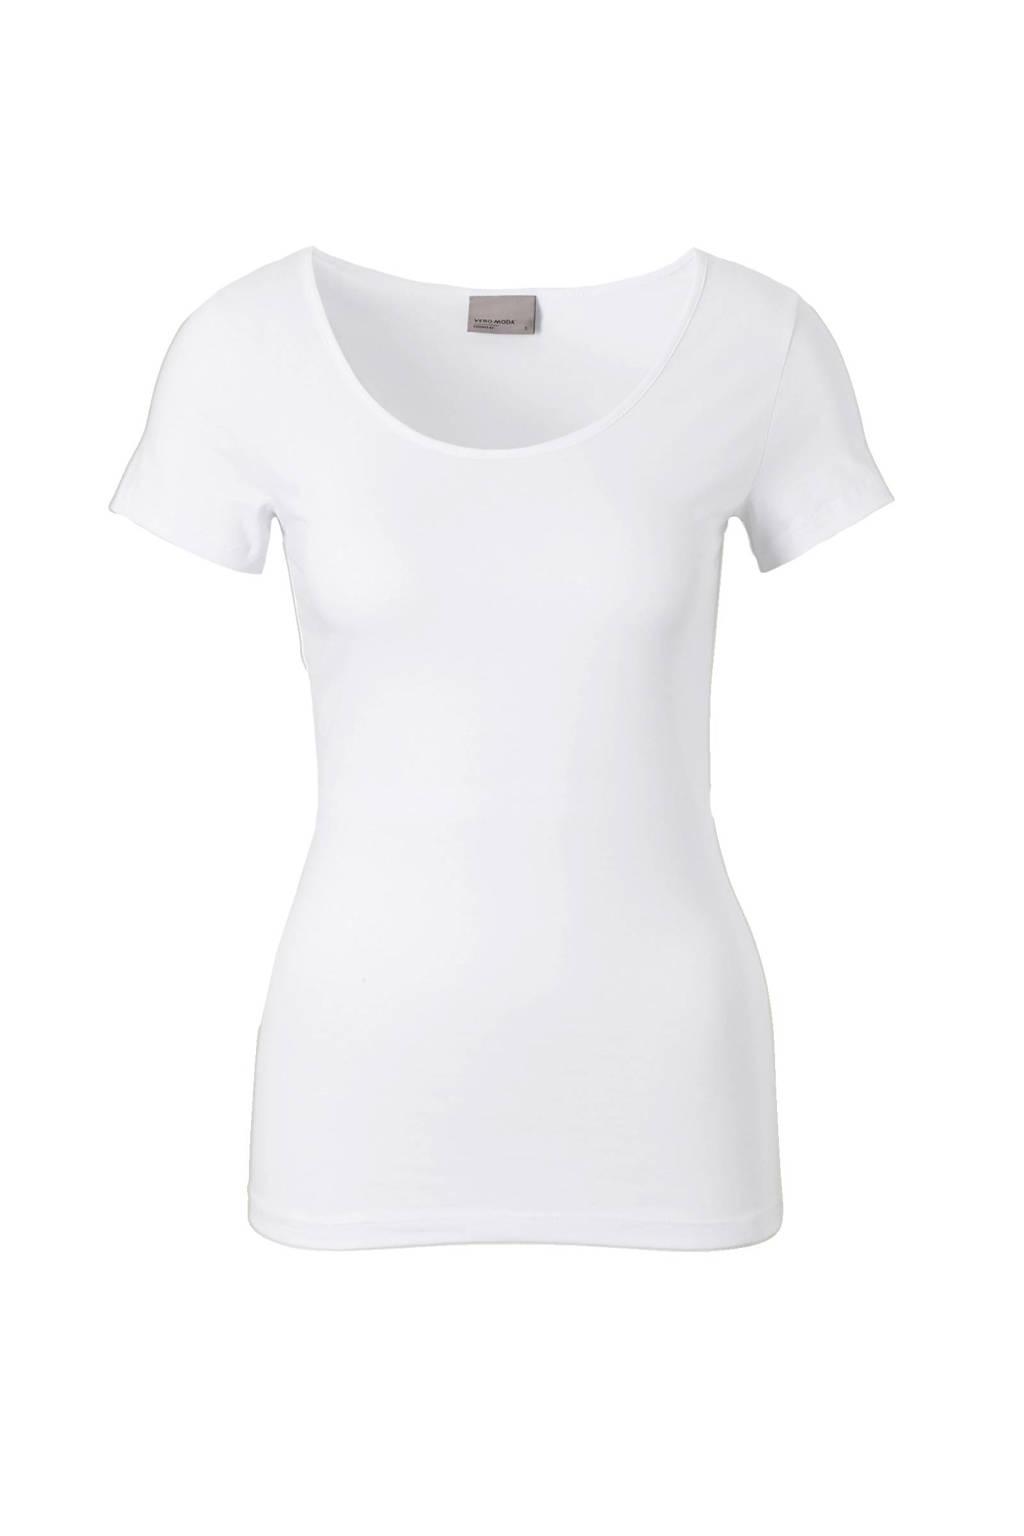 VERO MODA T-shirt, Wit